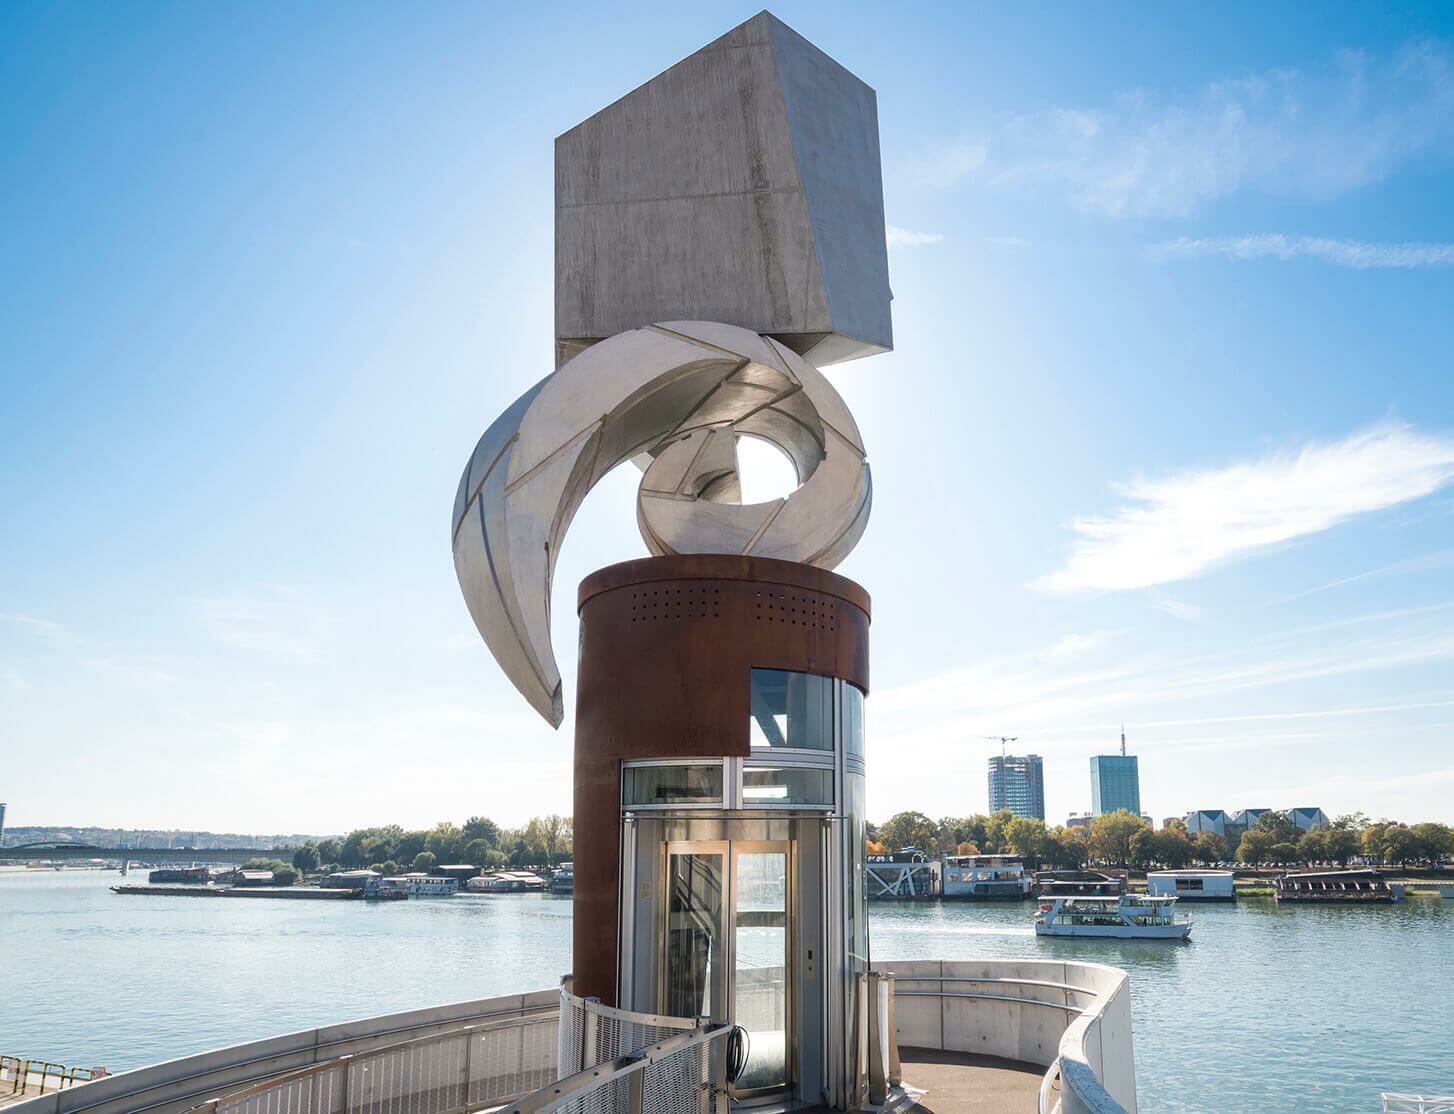 Collaborative project between Richard Deacon and Mrđan Bajić unveiled in Belgrade